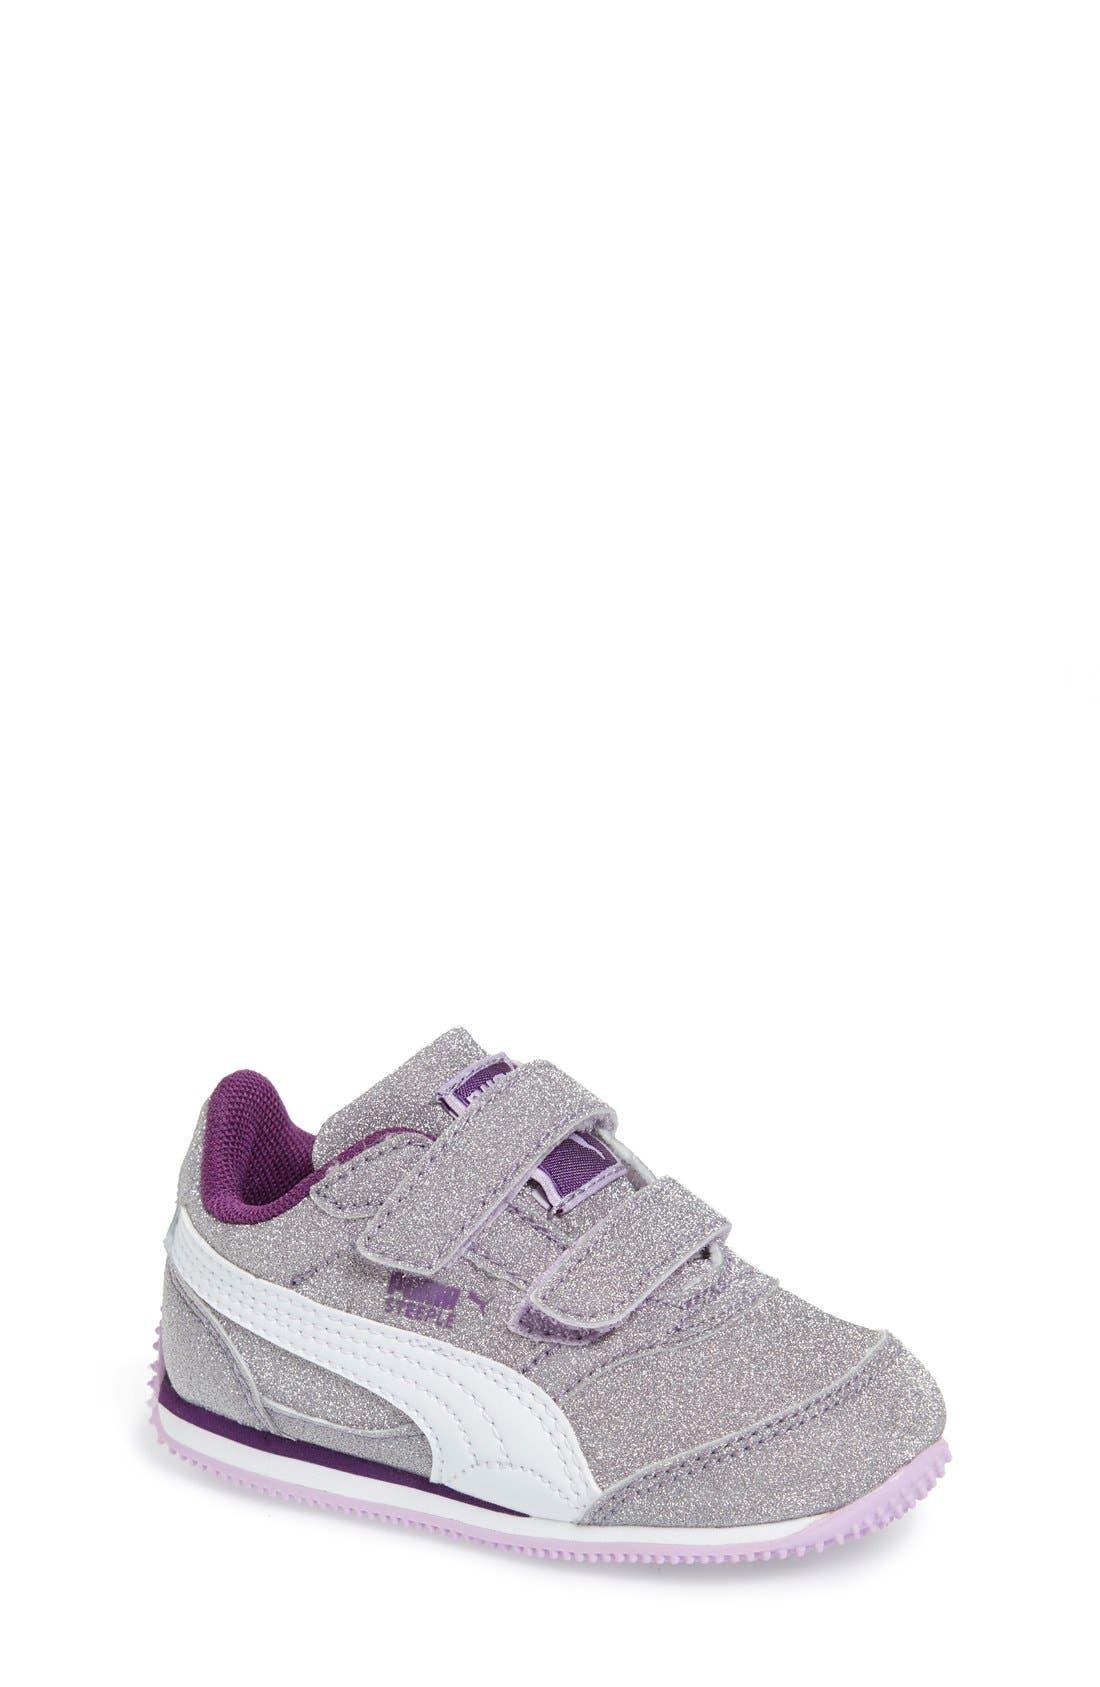 Main Image - PUMA 'Steeple Glitz' Sneaker (Baby, Walker, Toddler, Little Kid & Big Kid)